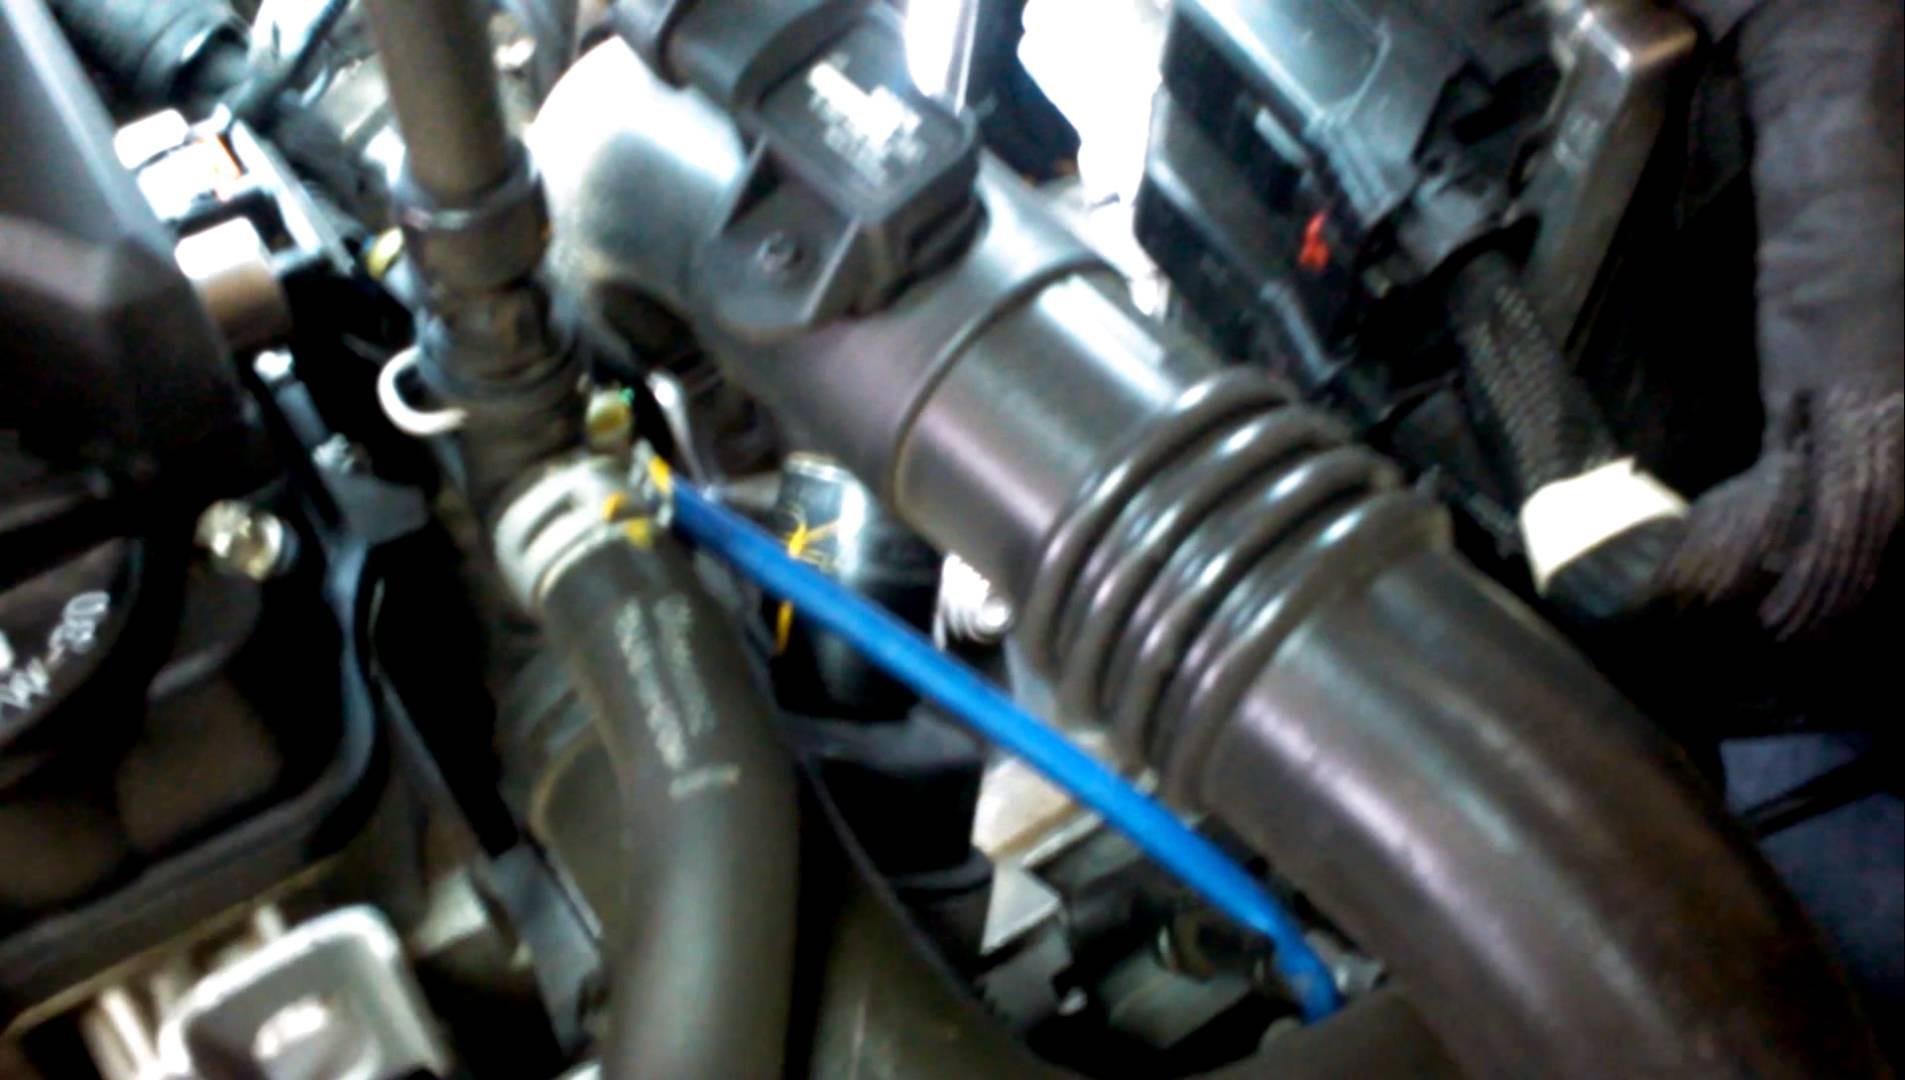 2012 chevy cruze engine diagram wiring diagram u2022 rh growbyte co 2011 Chevy Cruze Fender 2012 Chevy Cruze Co-op